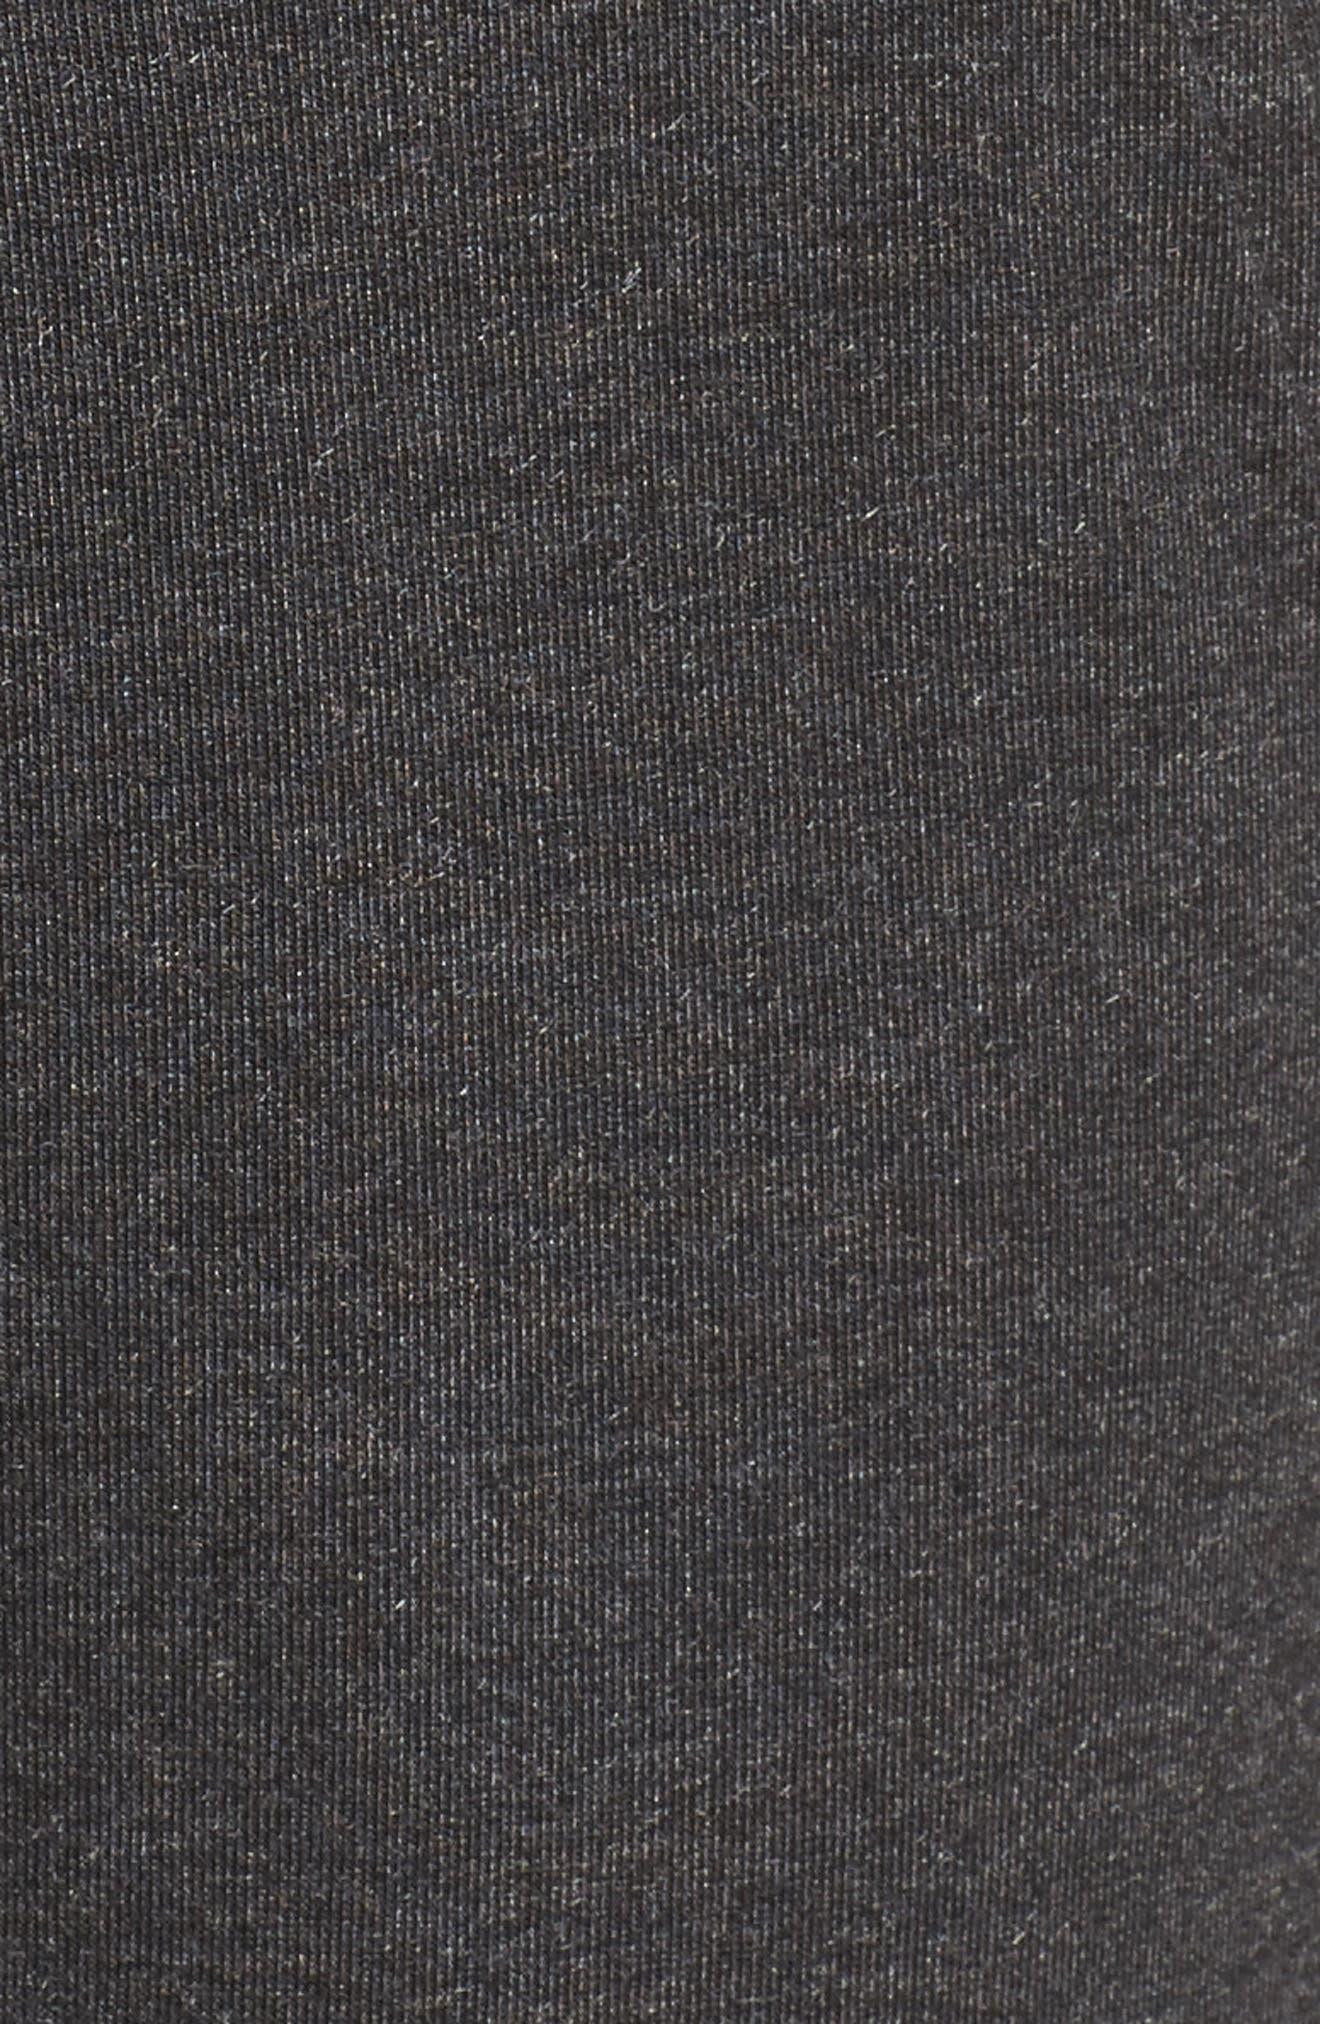 Harmony Crop Harem Pants,                             Alternate thumbnail 5, color,                             Grey Dark Charcoal Heather